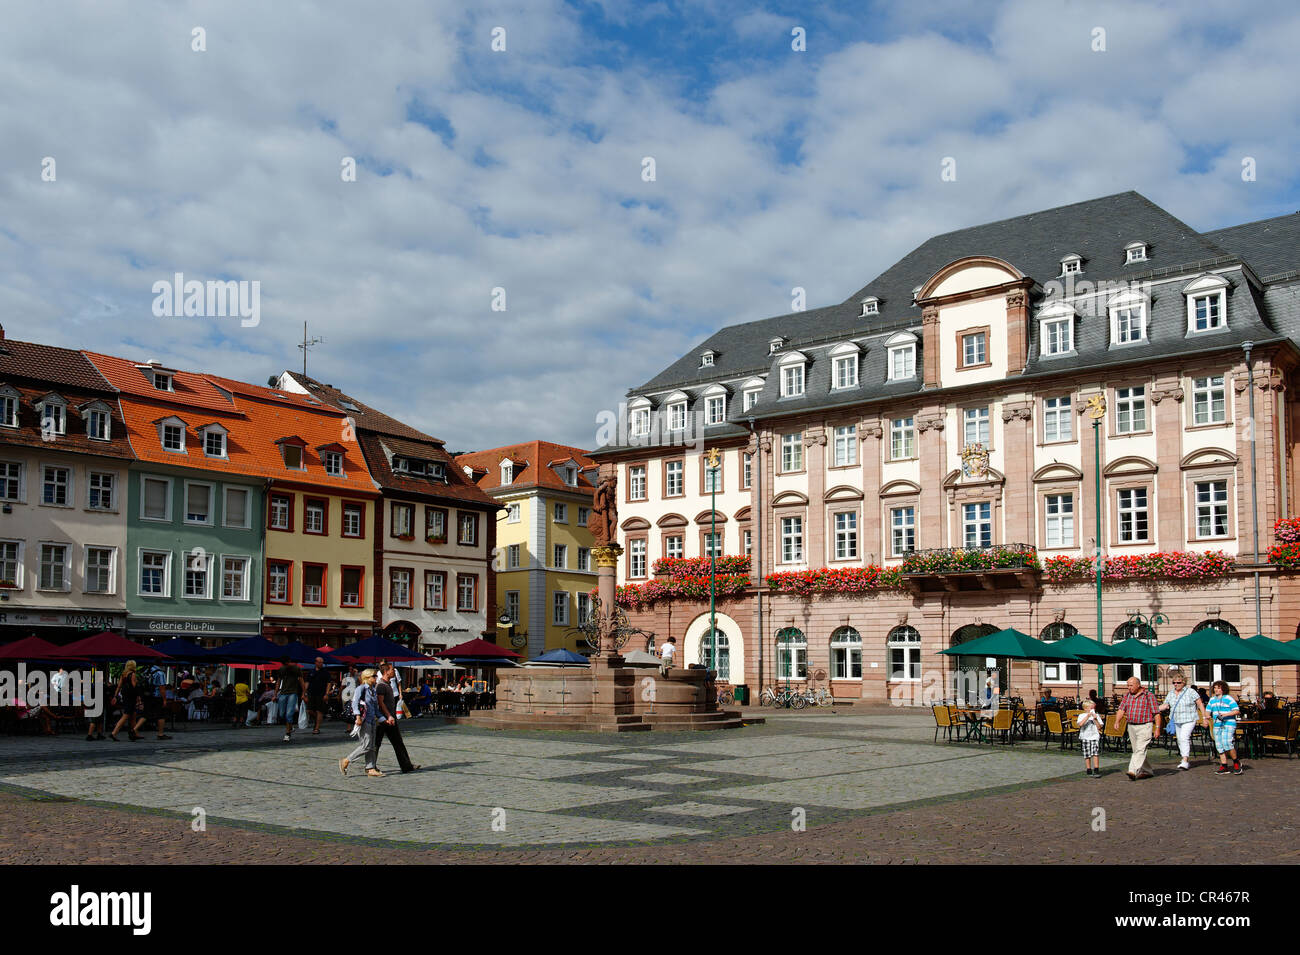 Hôtel de ville avec la Fontaine d'Hercule, Heidelberg, Bade-Wurtemberg, Allemagne, Europa Photo Stock